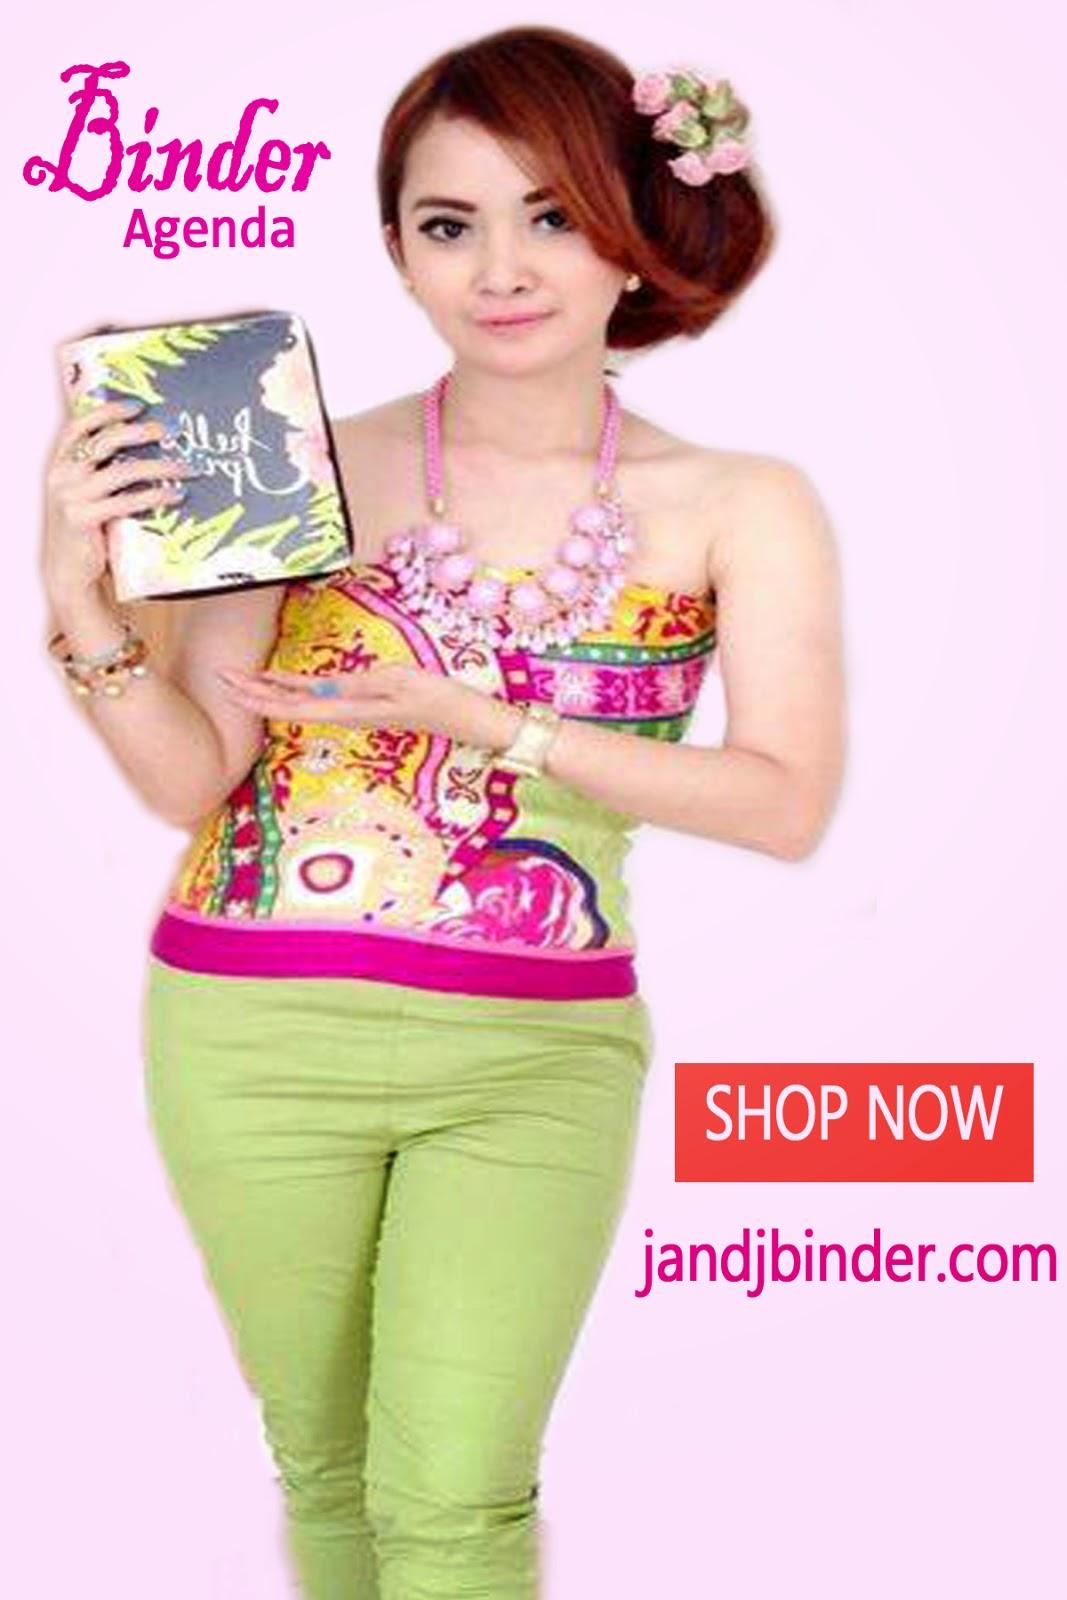 http://www.jandjbinder.com/